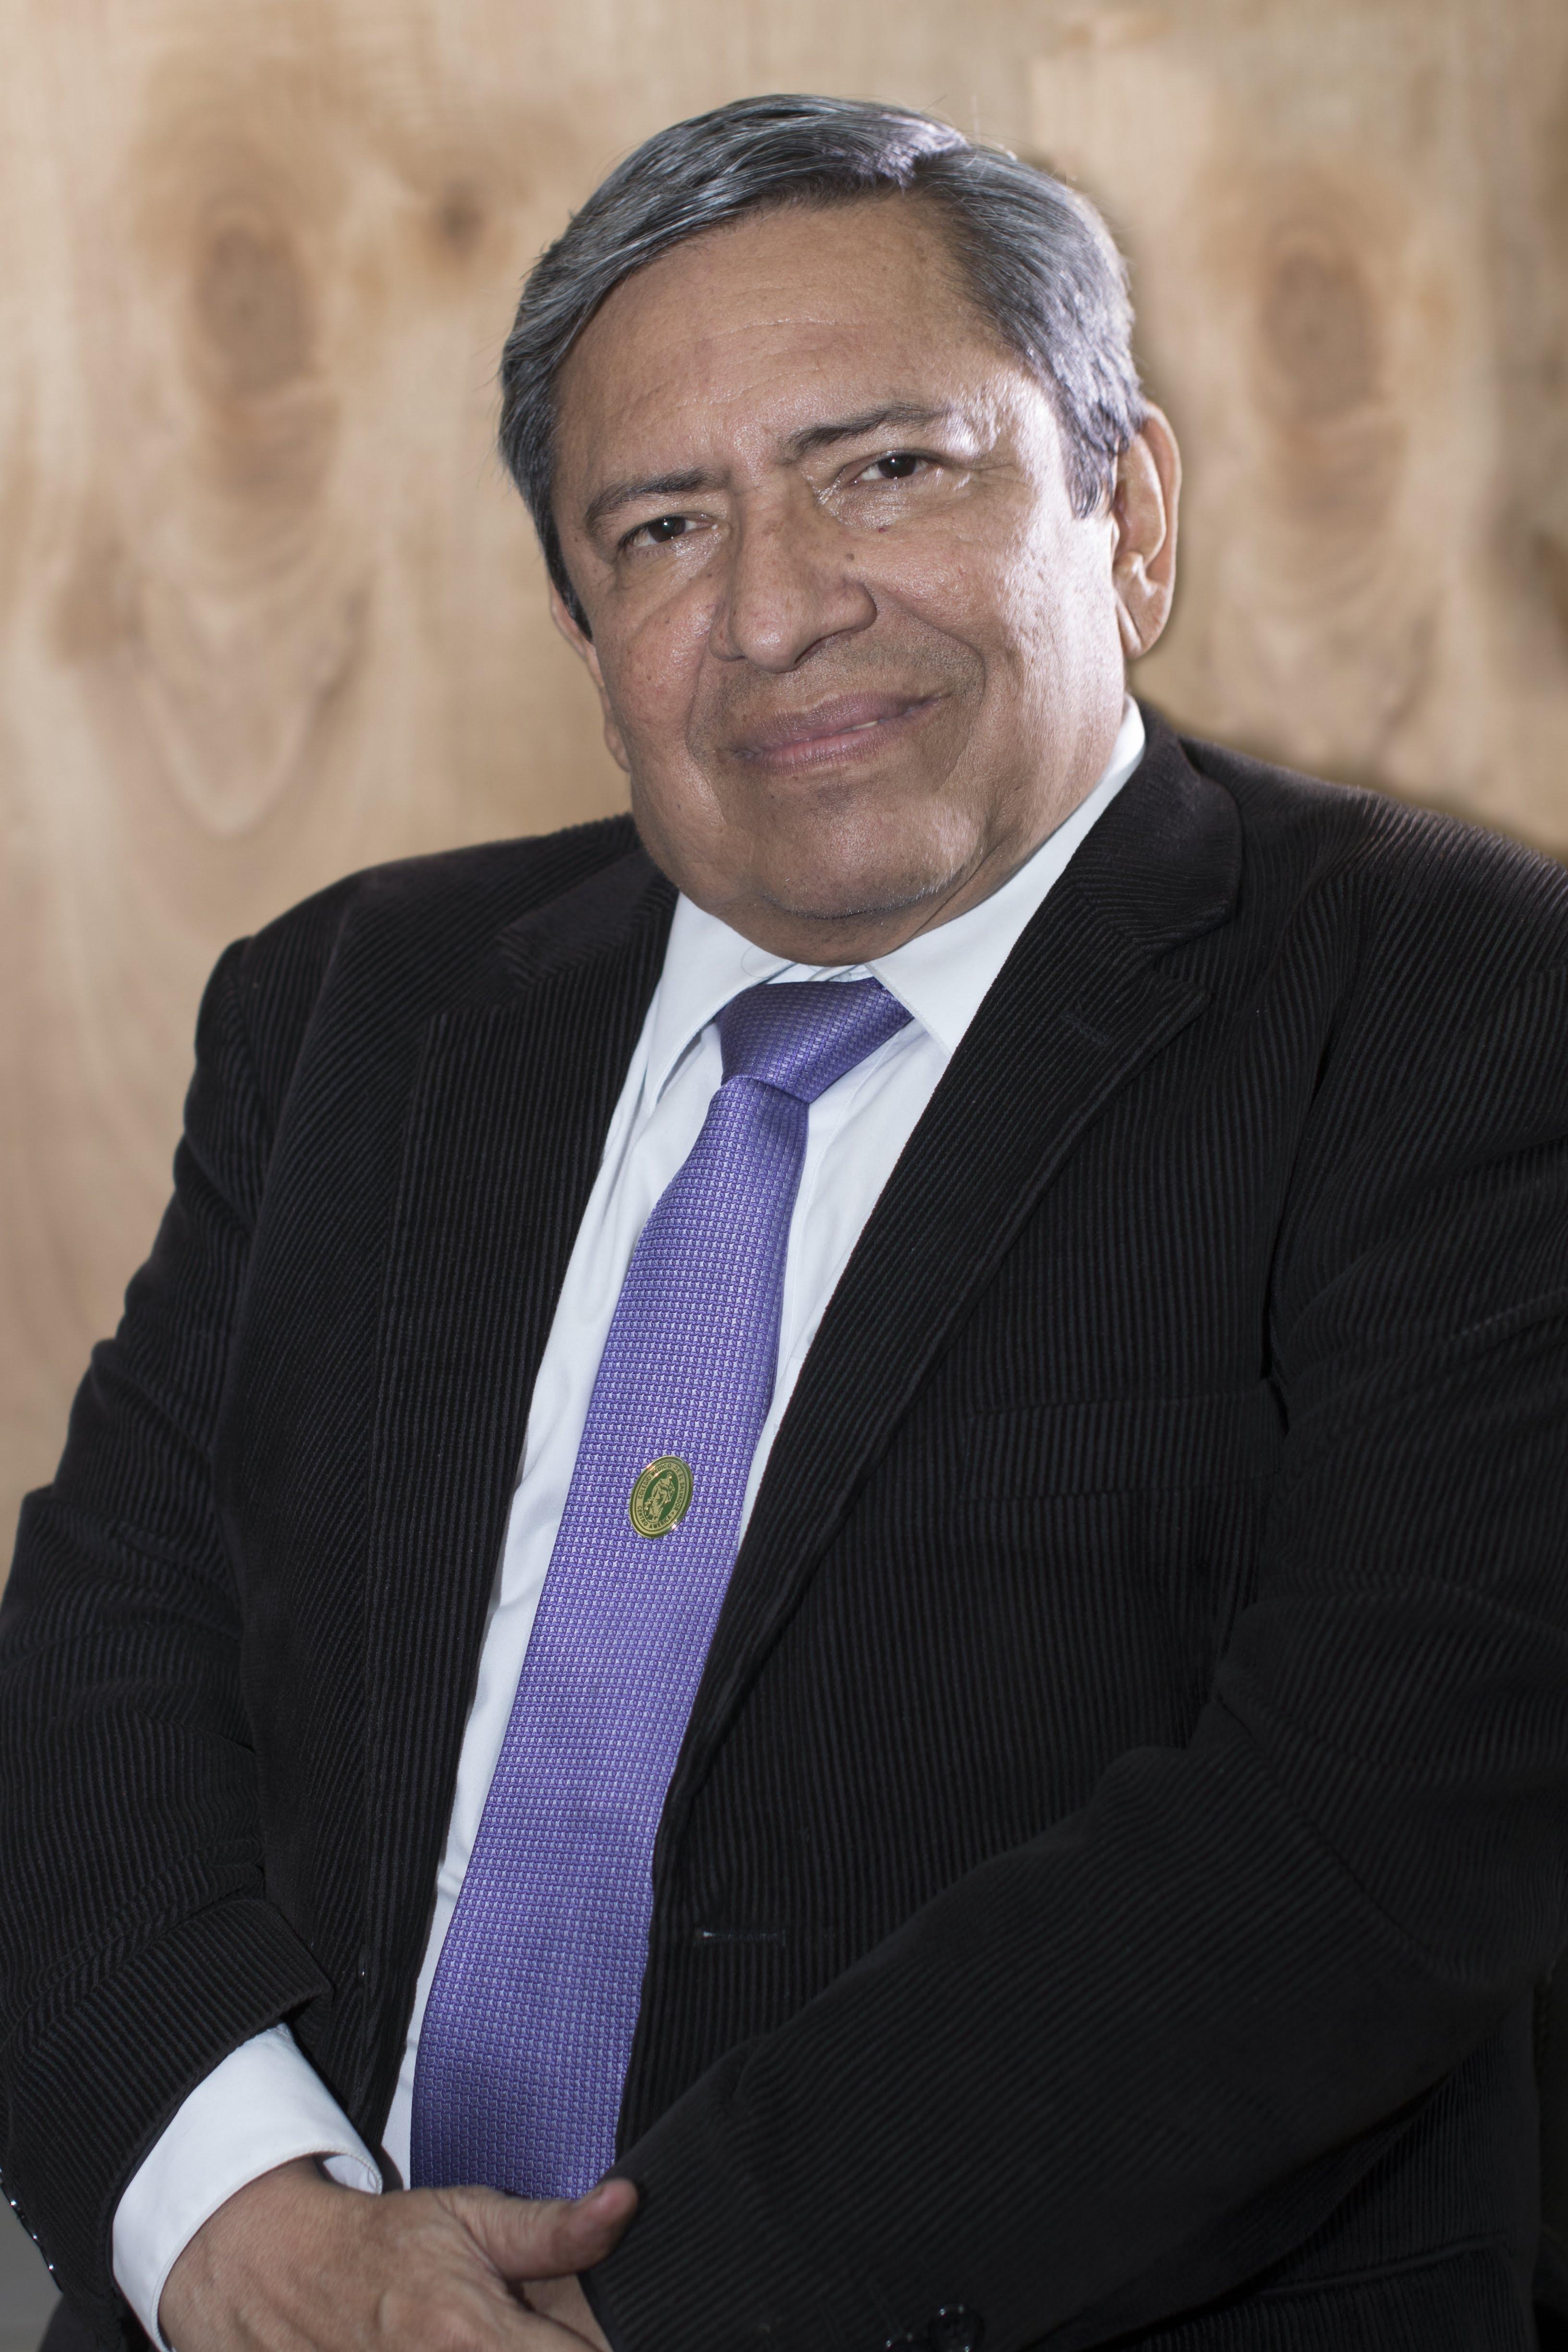 Dr. Roberto Ticas